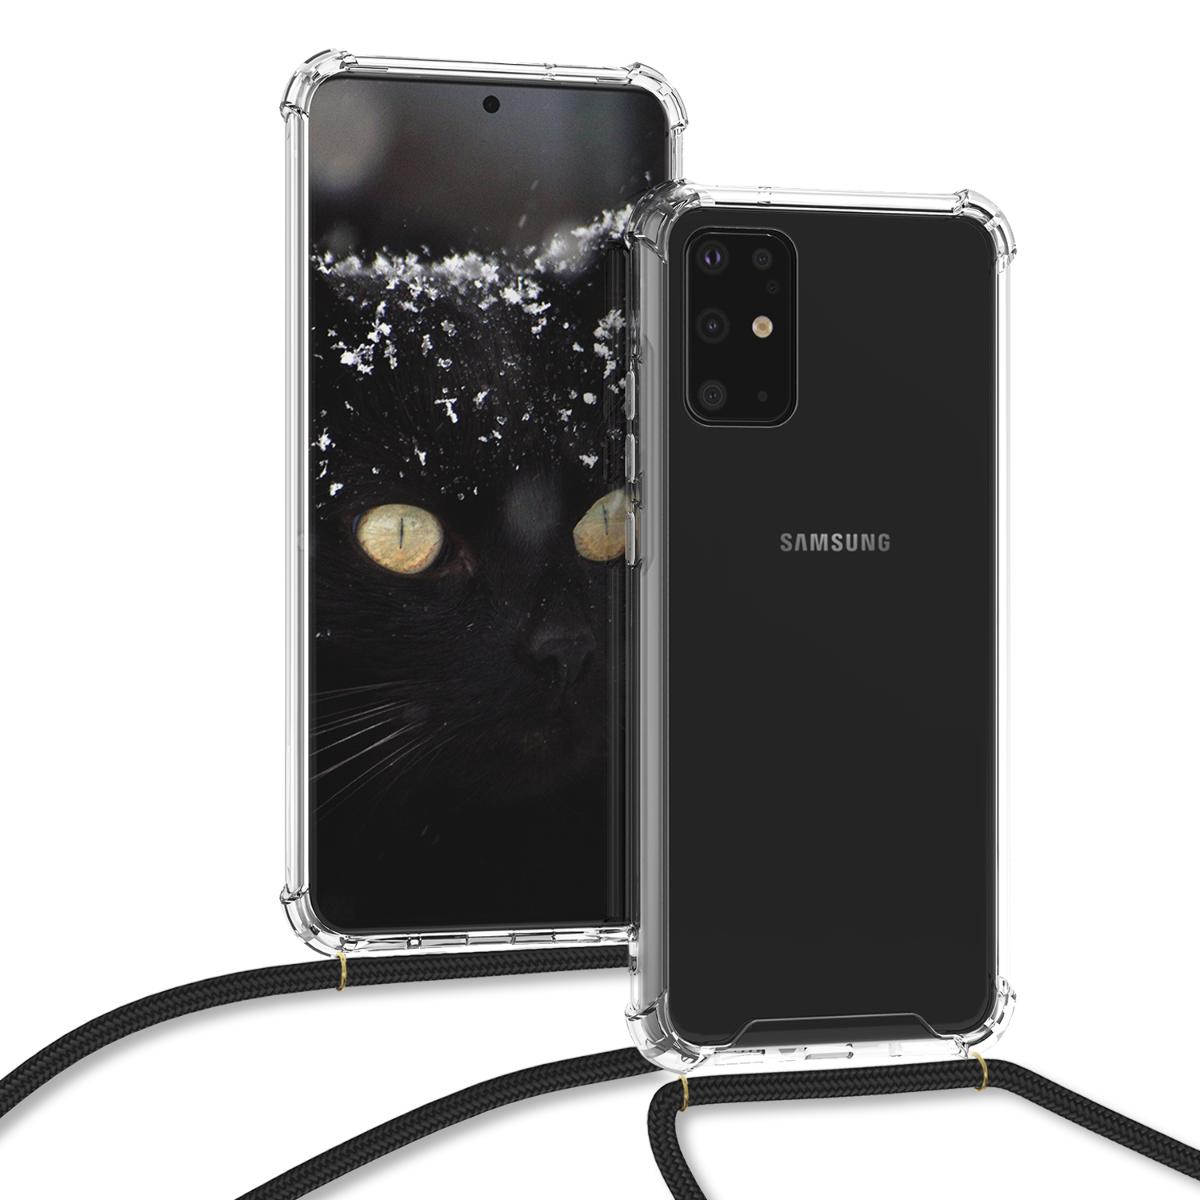 KW Θήκη Σιλικόνης με Λουράκι Λαιμού Samsung Galaxy S20 Plus - Black / Transparent (51223.01)